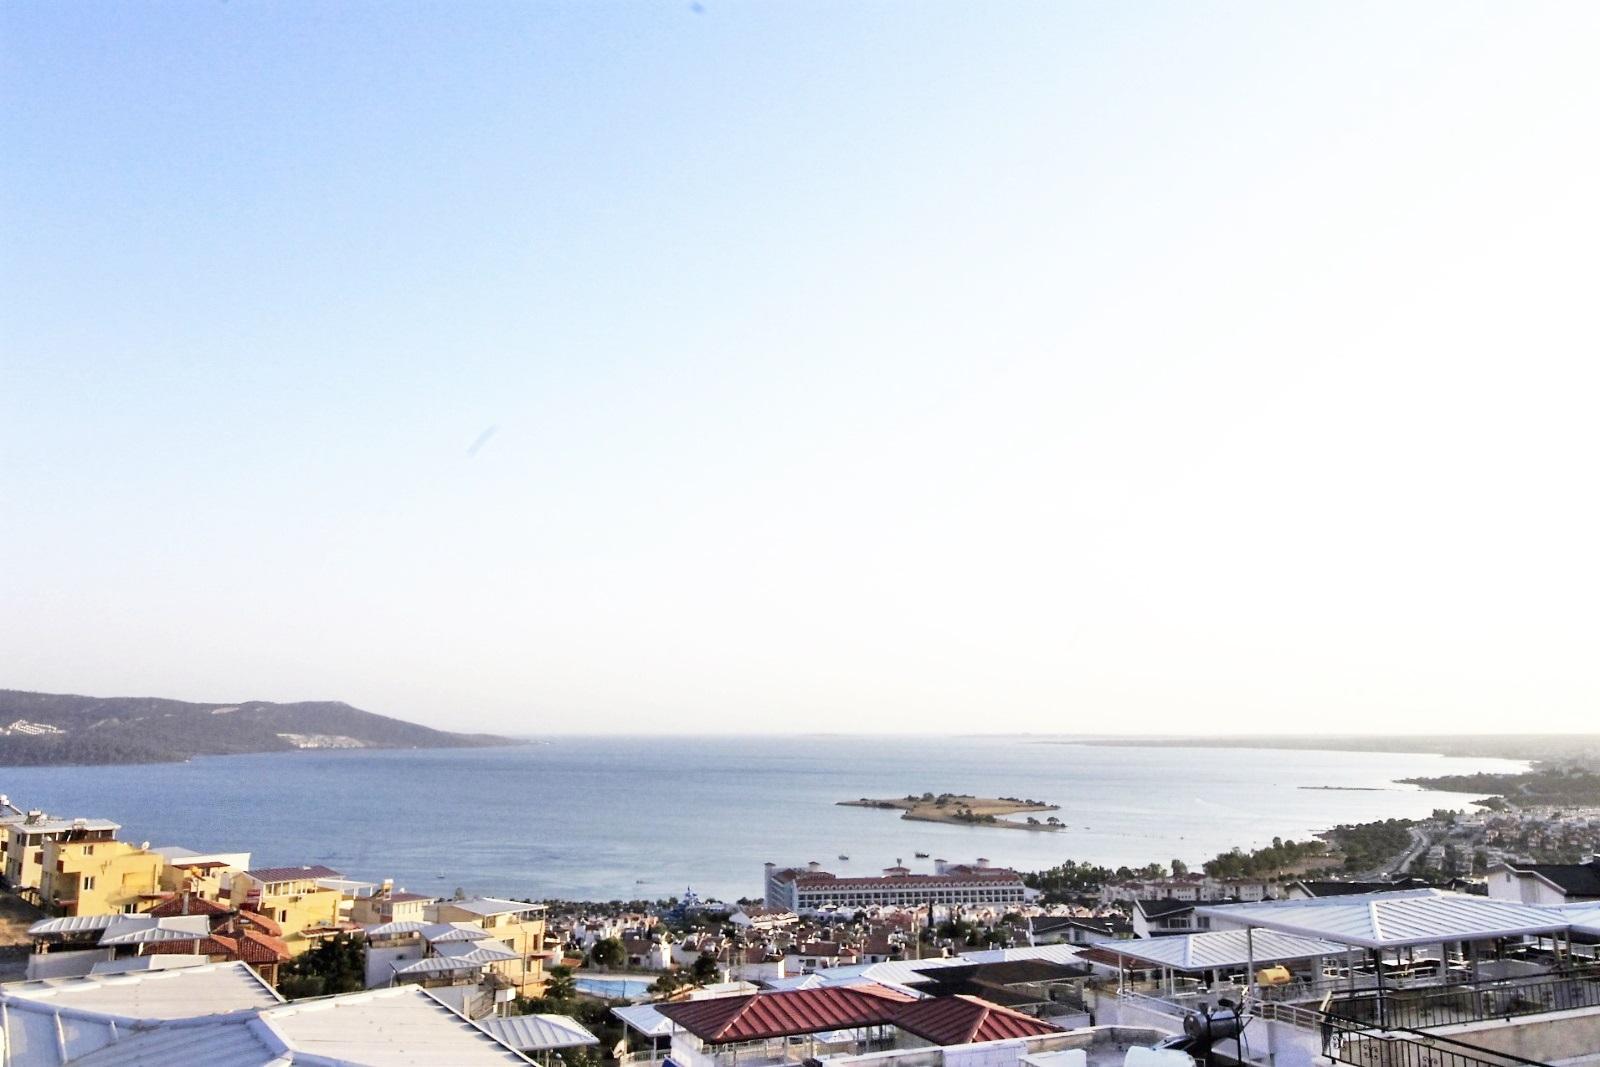 3-Bed Villa 800m to beach in Akbuk – Stunning Sea View Detached Villa